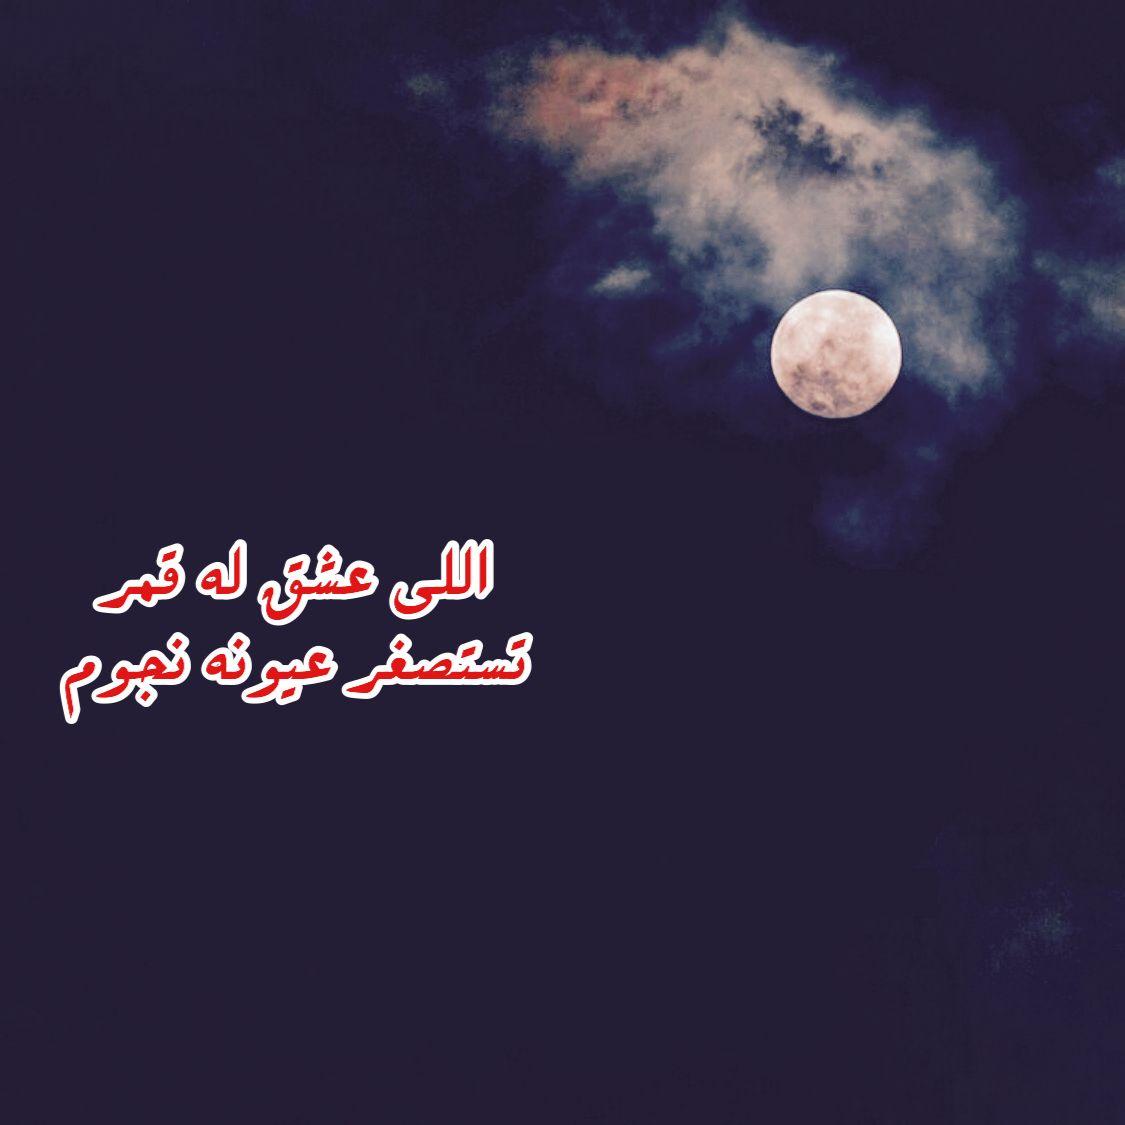 اللي عشق له قمر تستصغر عيونه نجوم Happy Sunshine Arabi Happy